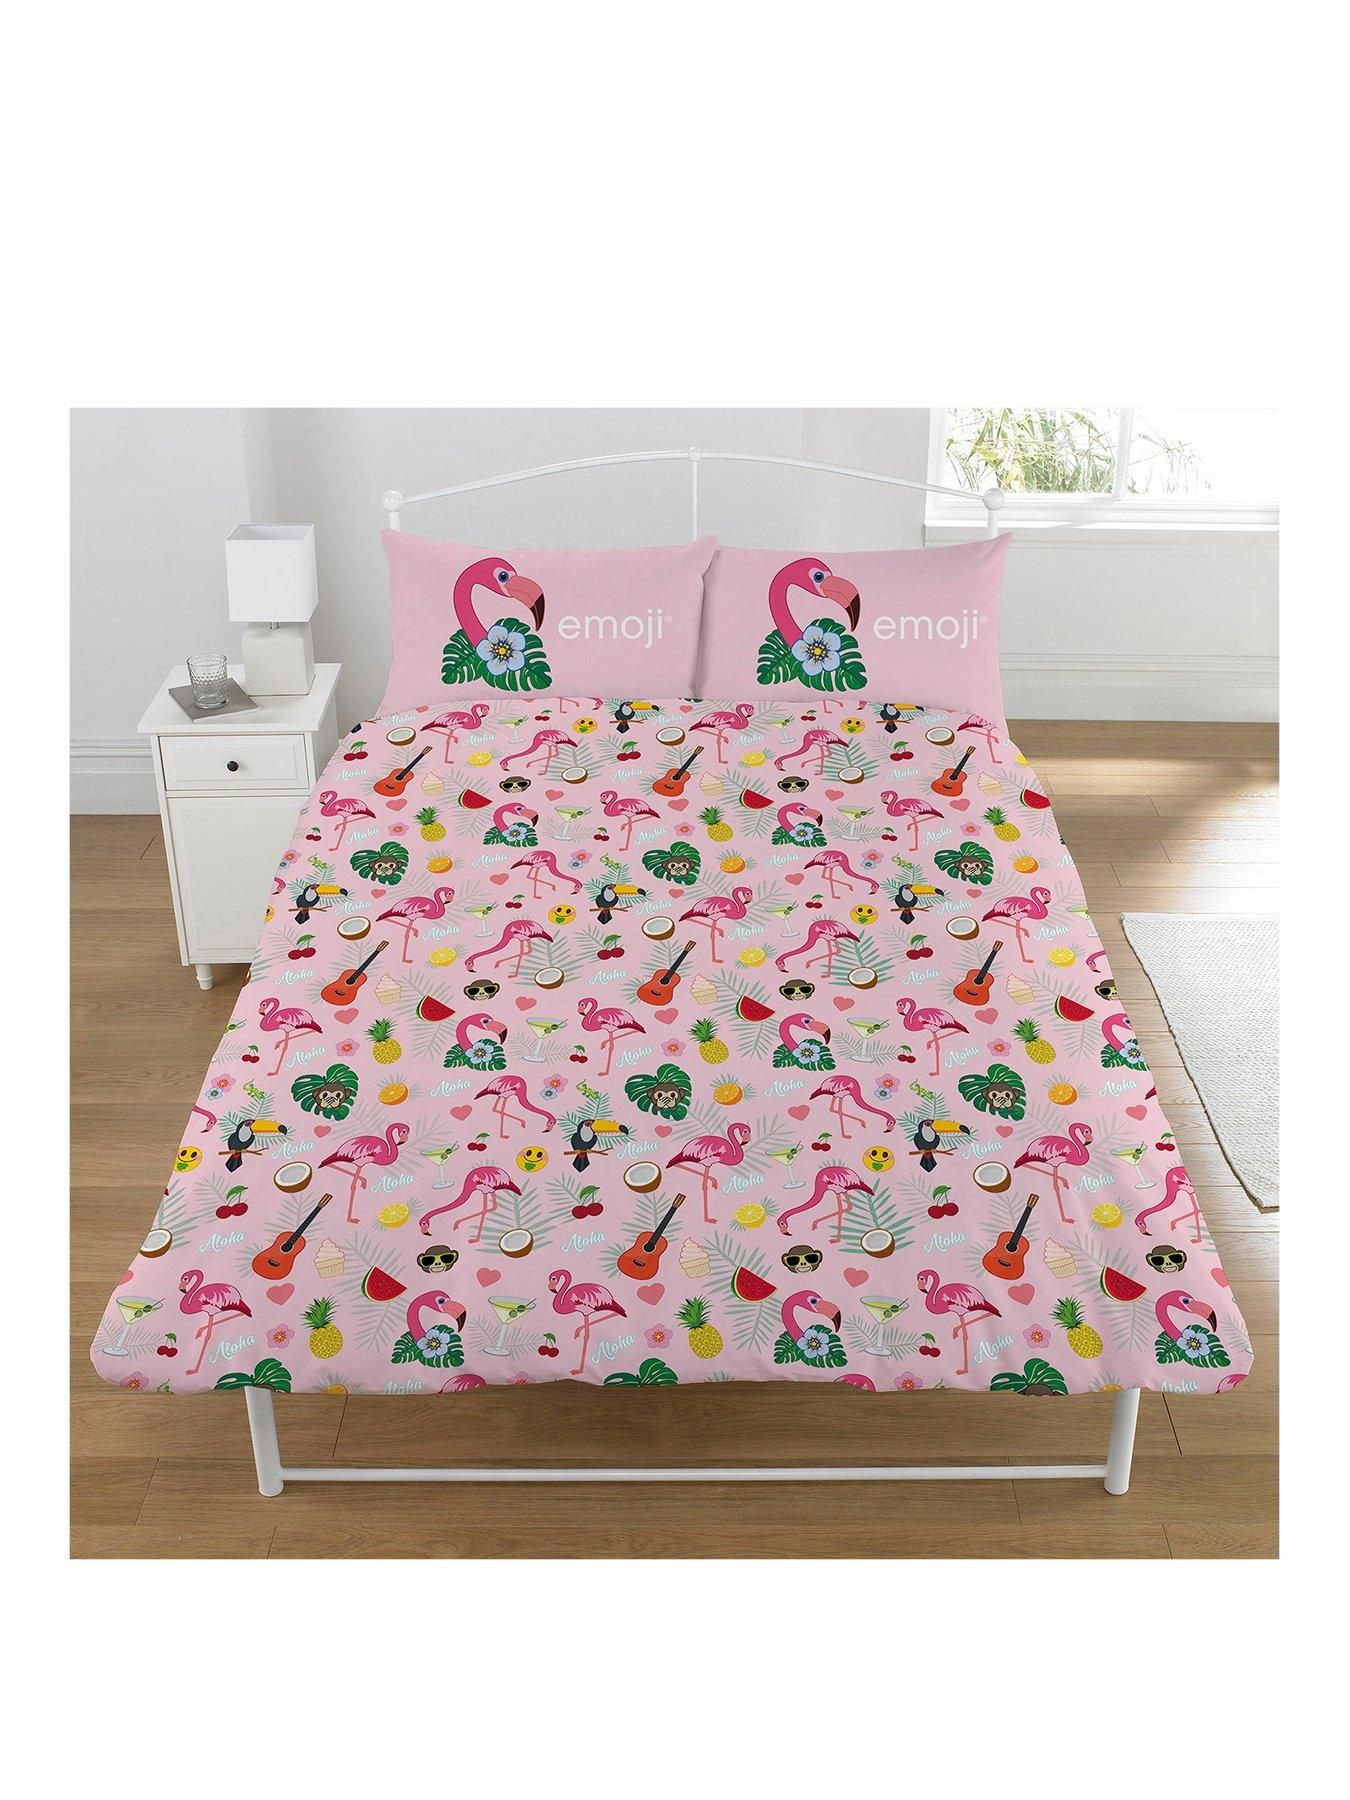 Emoji Flamingo Double Duvet Cover Set